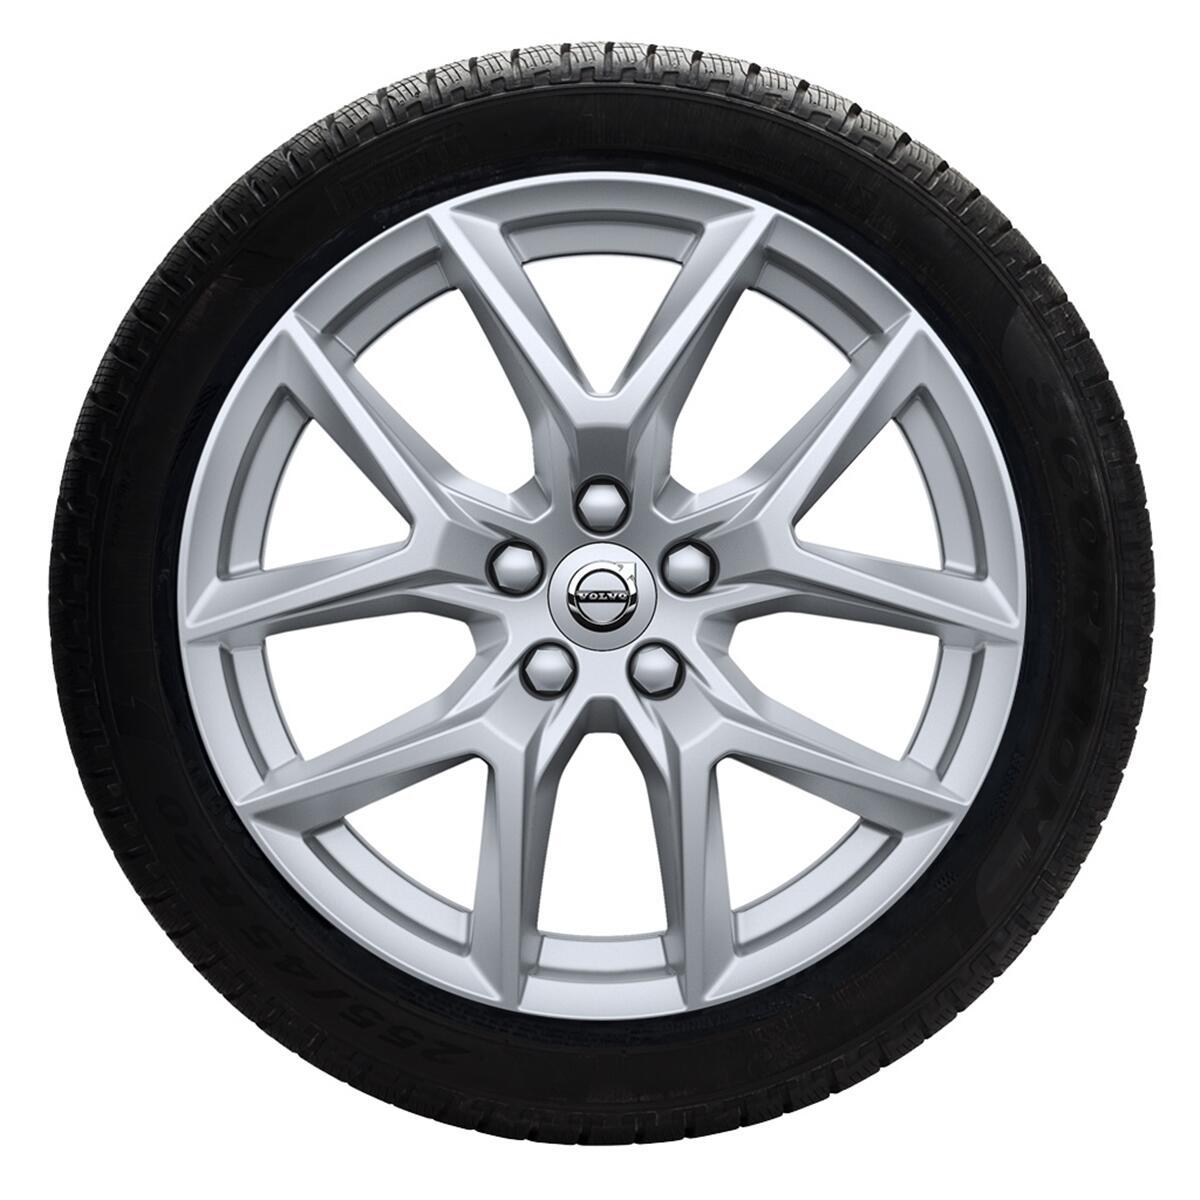 "Komplet zimskih točkova 18"" naplaci s 5-Y krakova srebrni, pneumatici Pirelli"